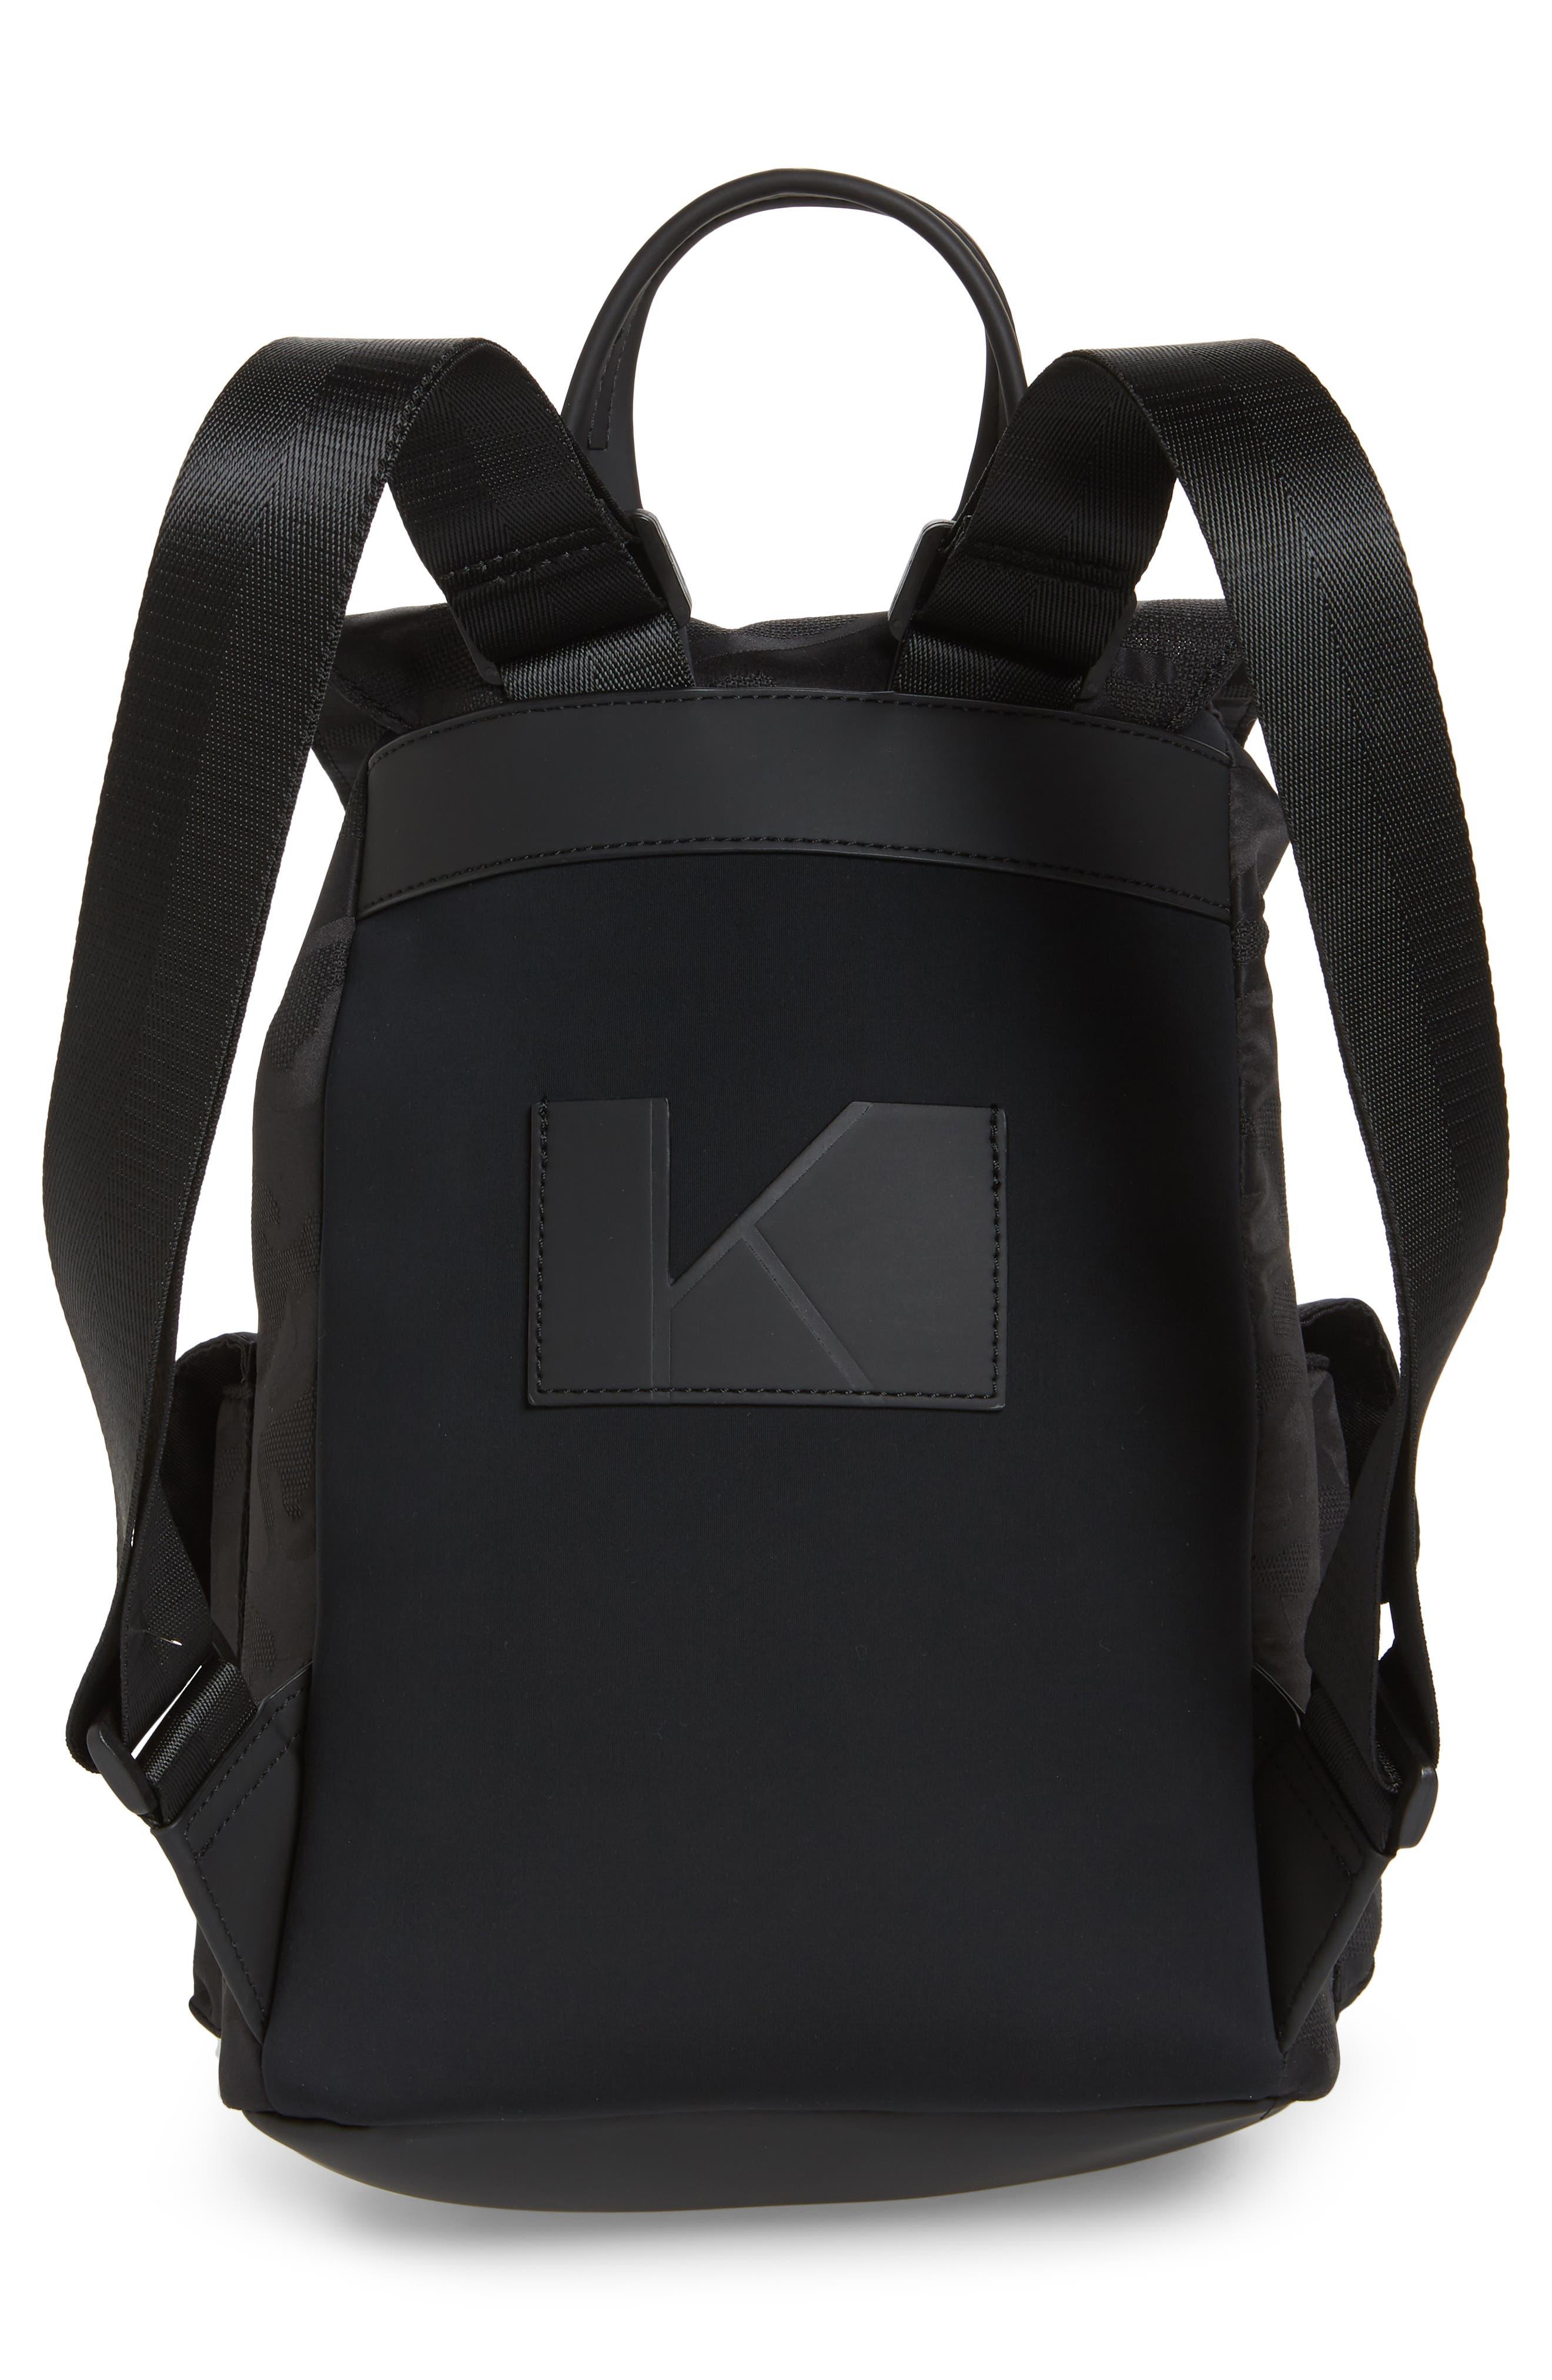 Parker Water Resistant Backpack,                             Alternate thumbnail 6, color,                             Black Camo